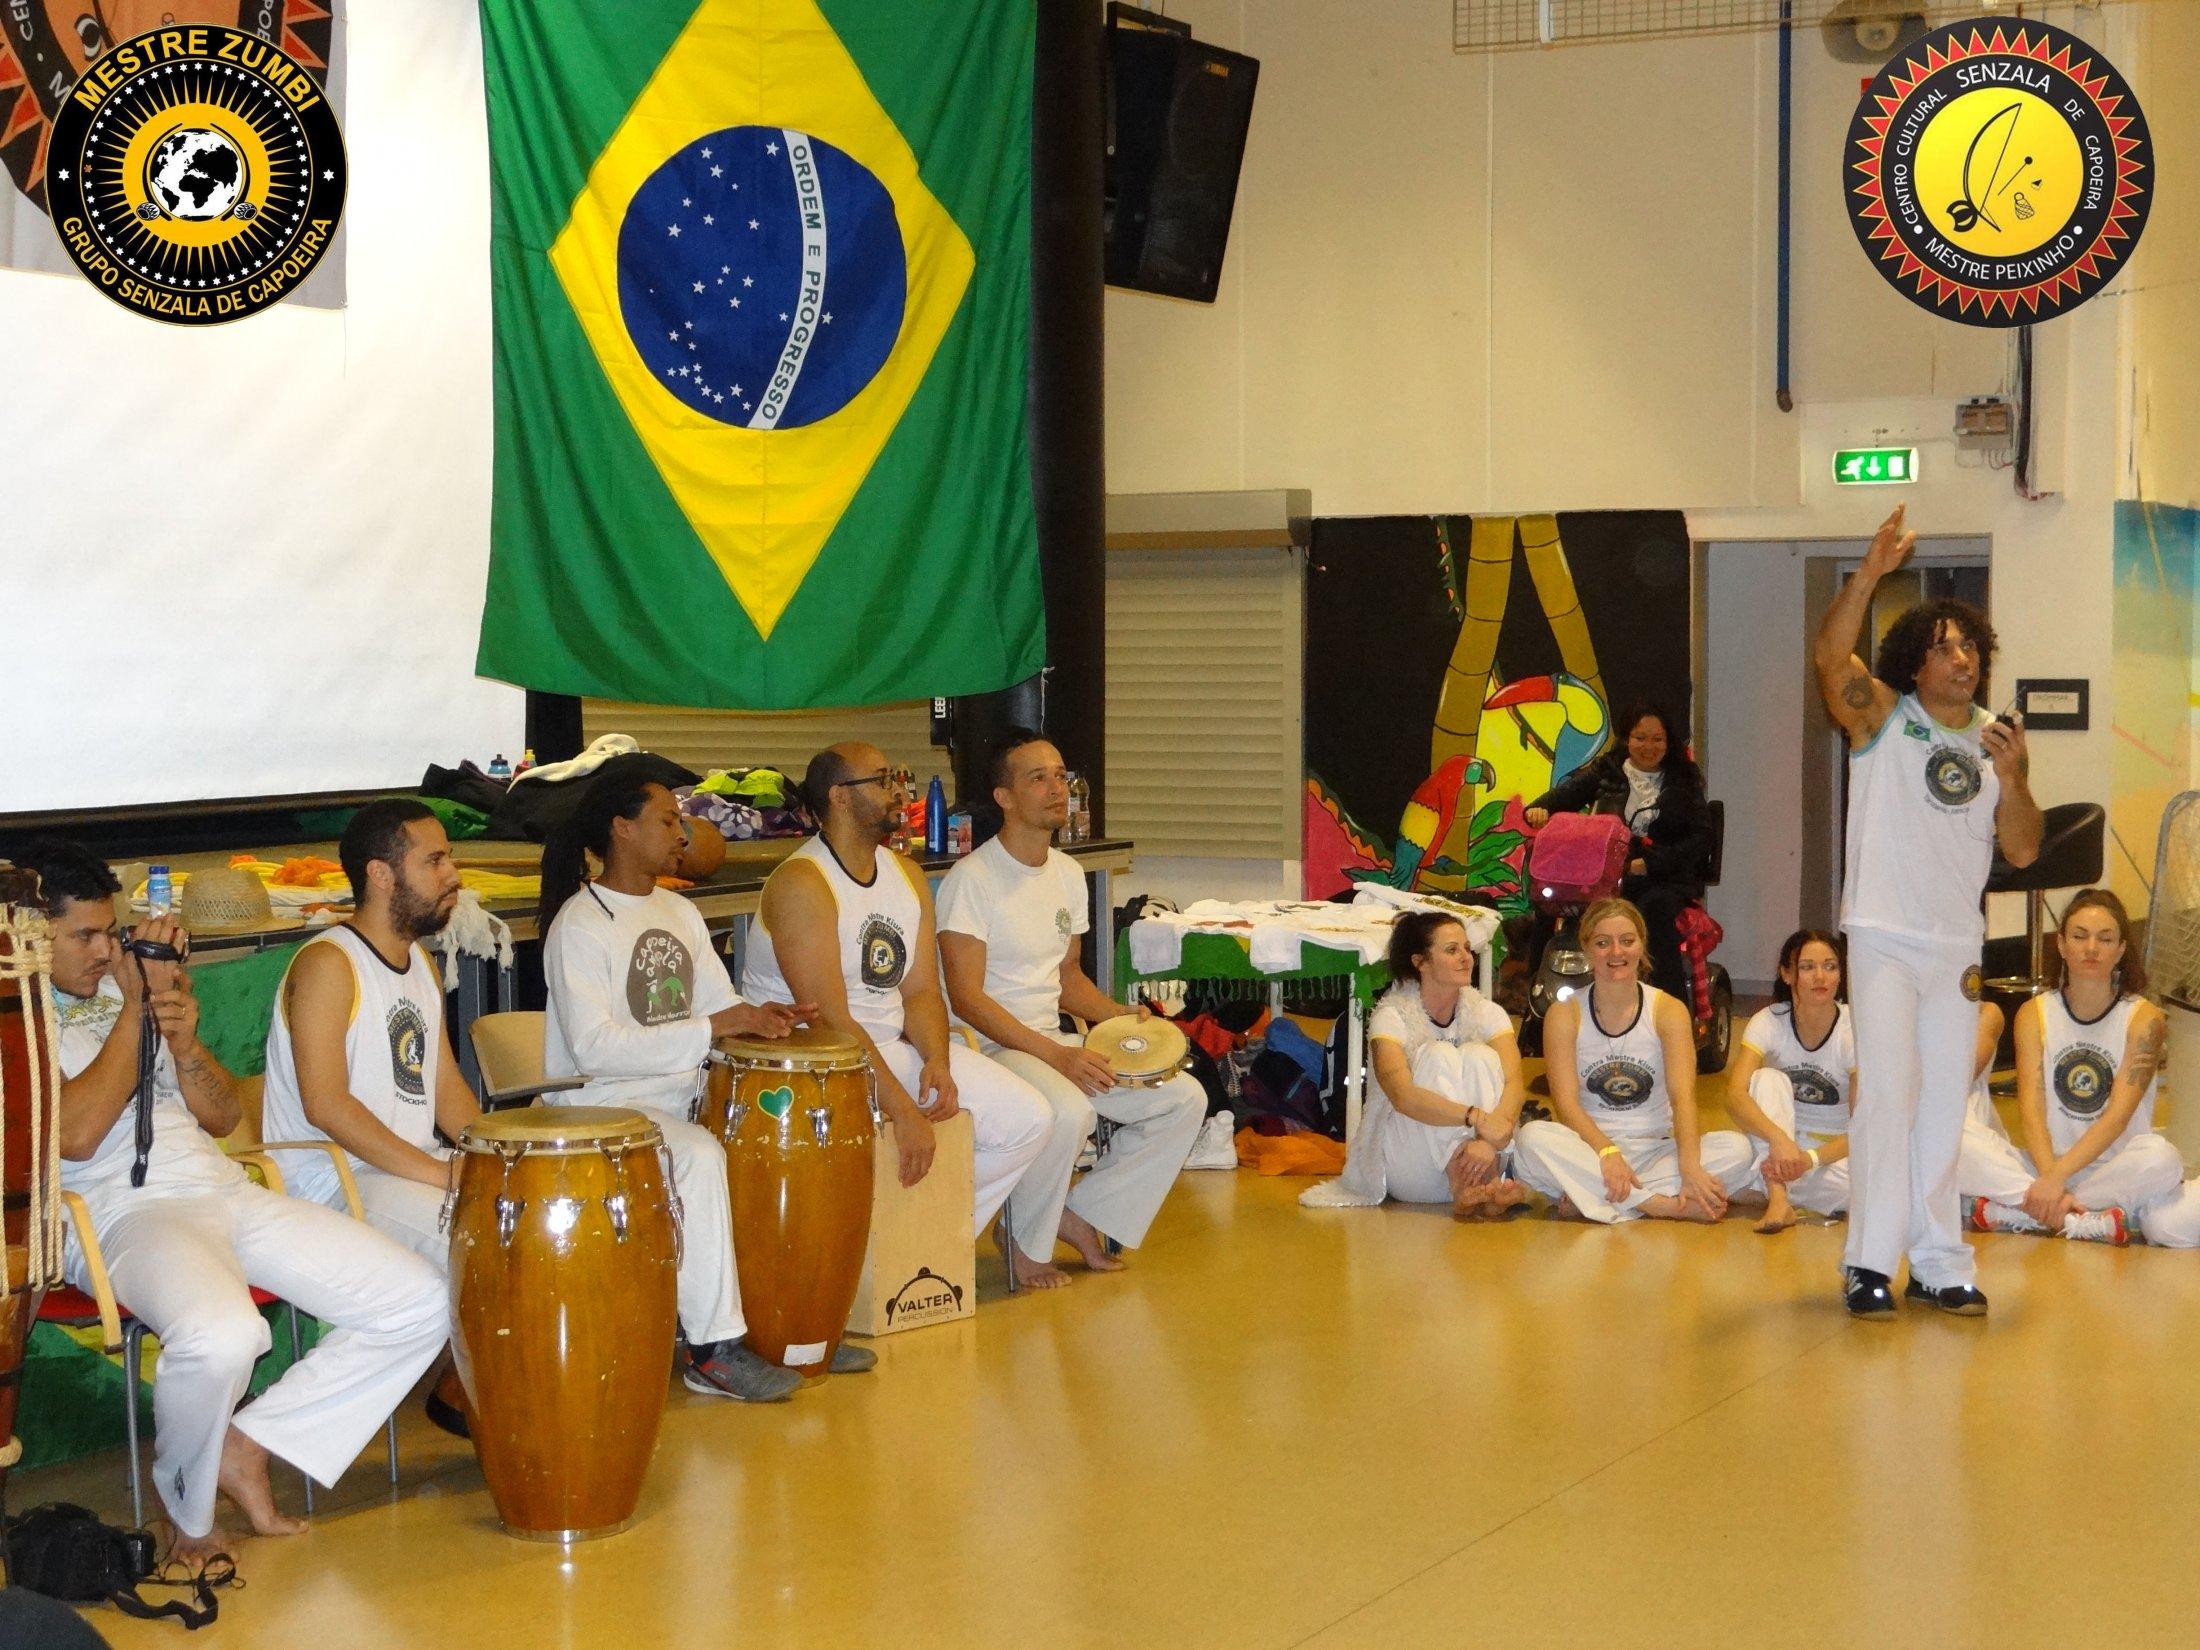 2013-12-14 - Capoeira 040